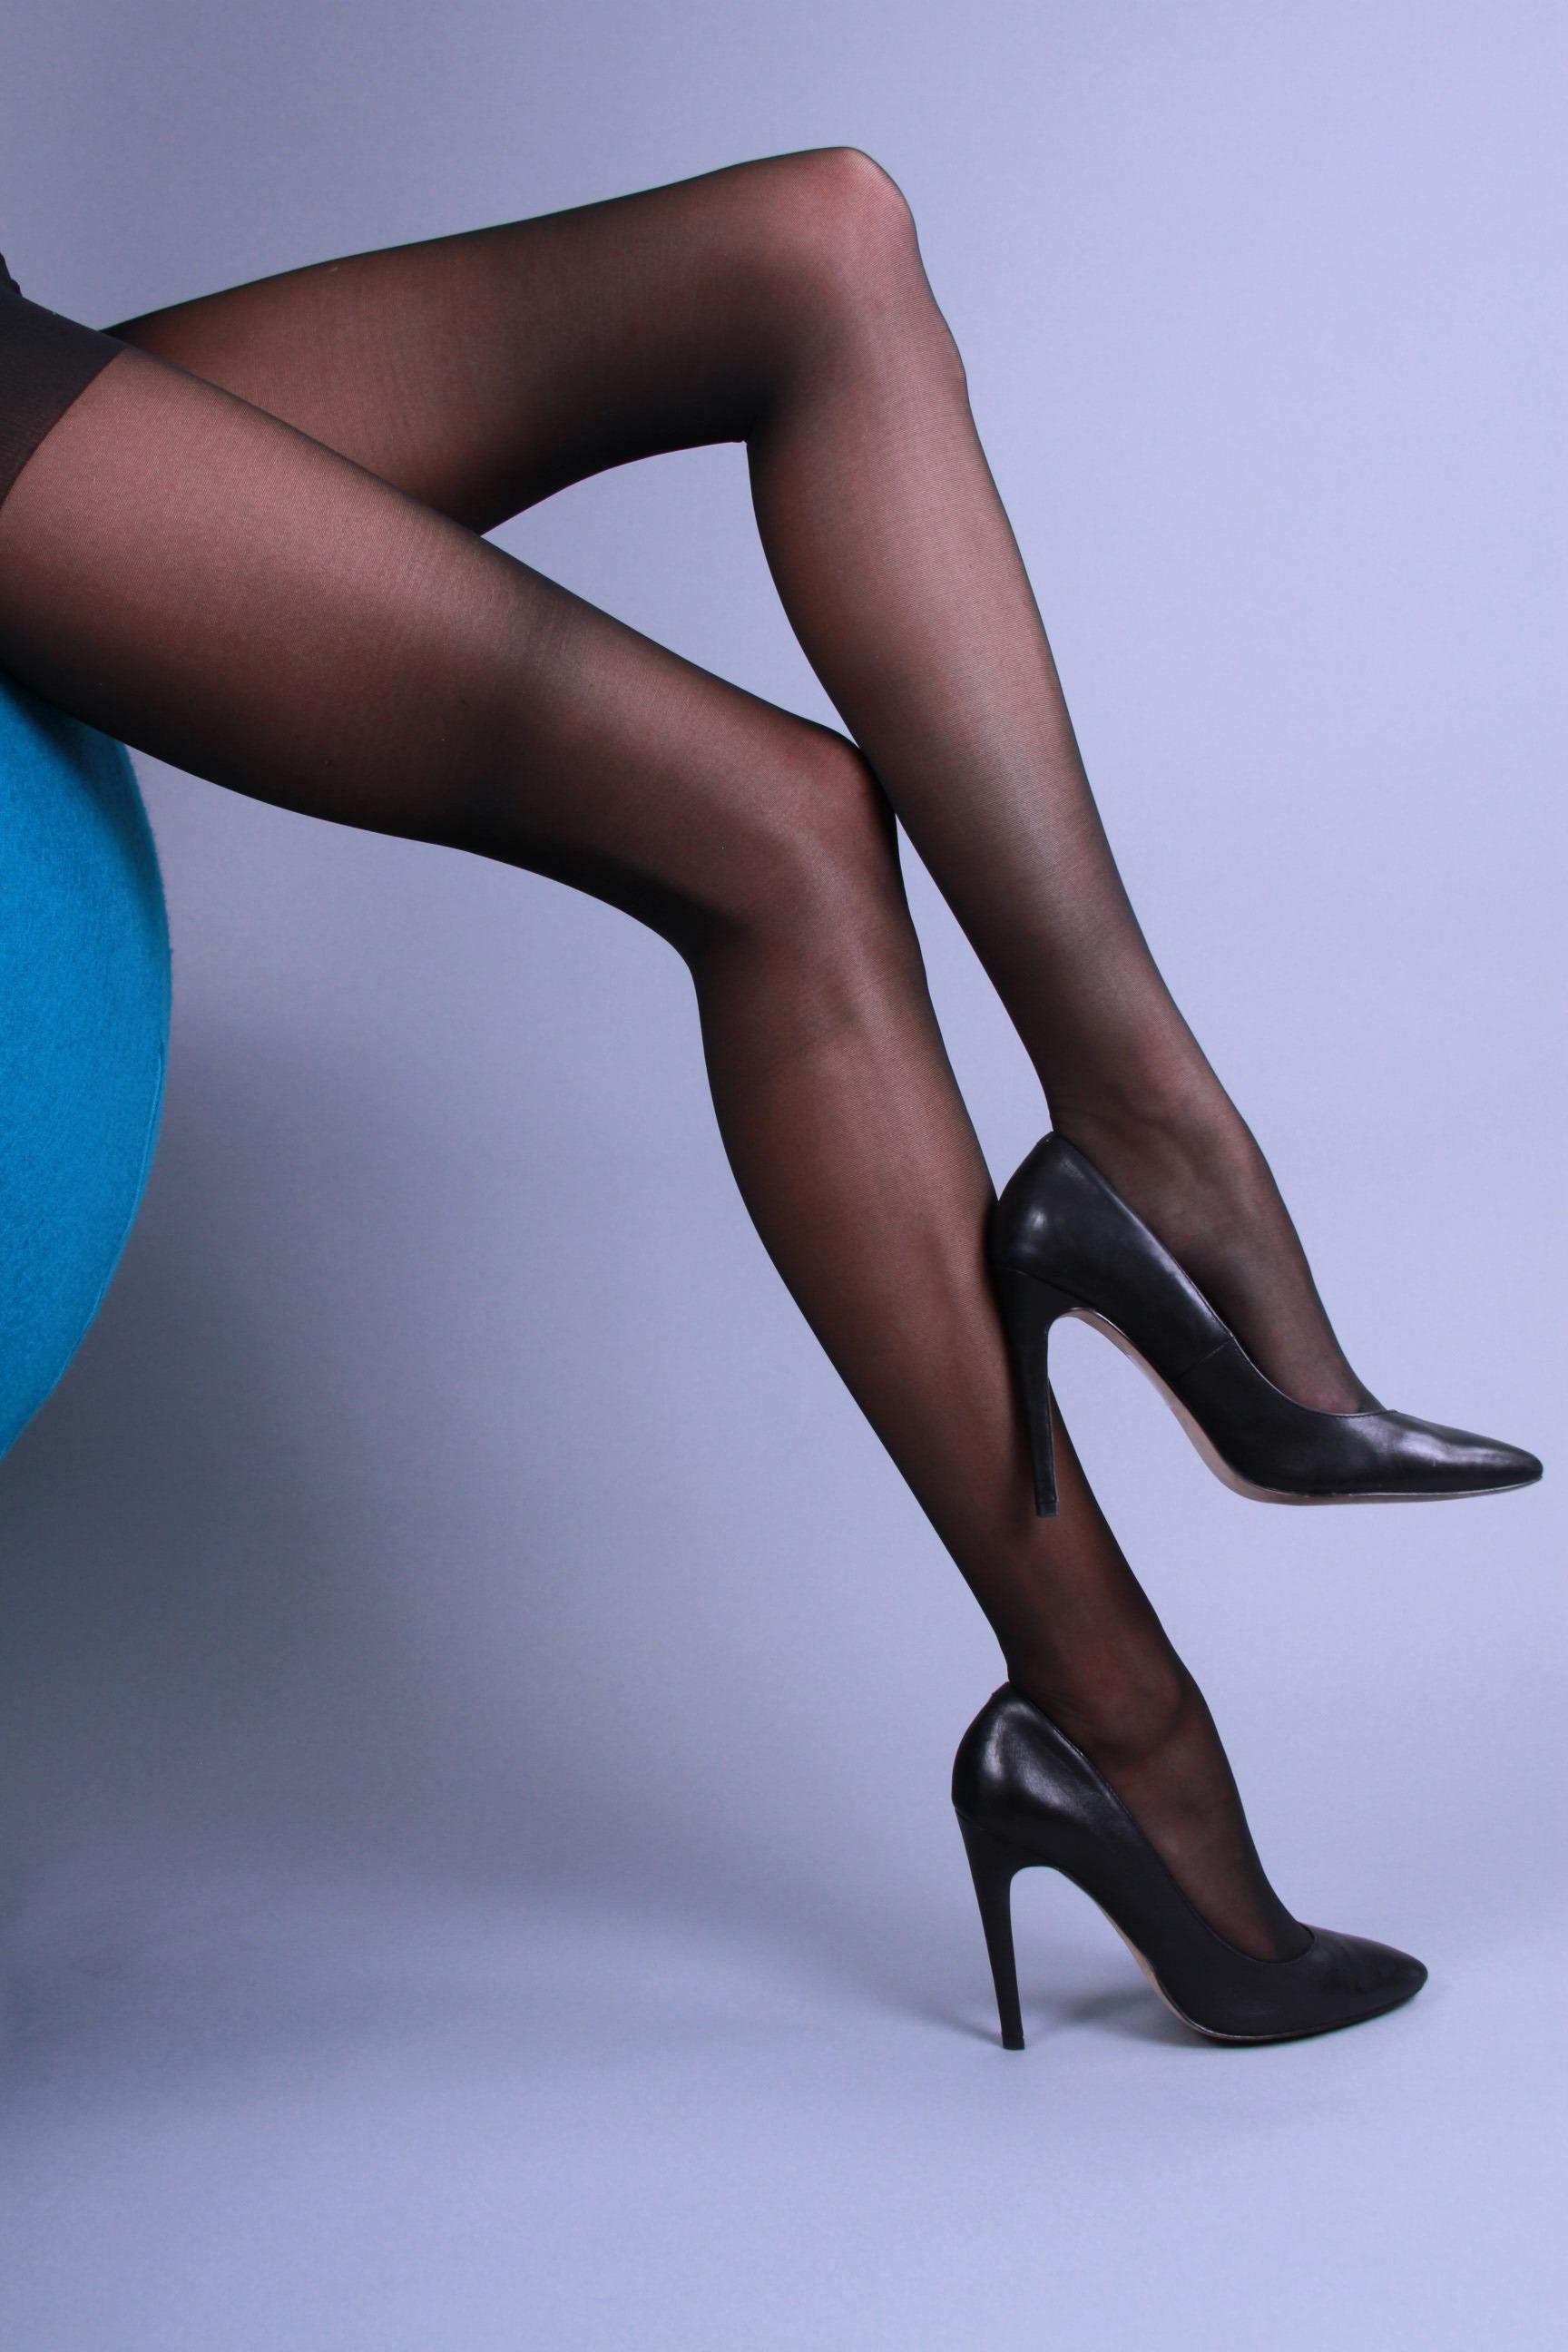 Brea Peck_Legs1